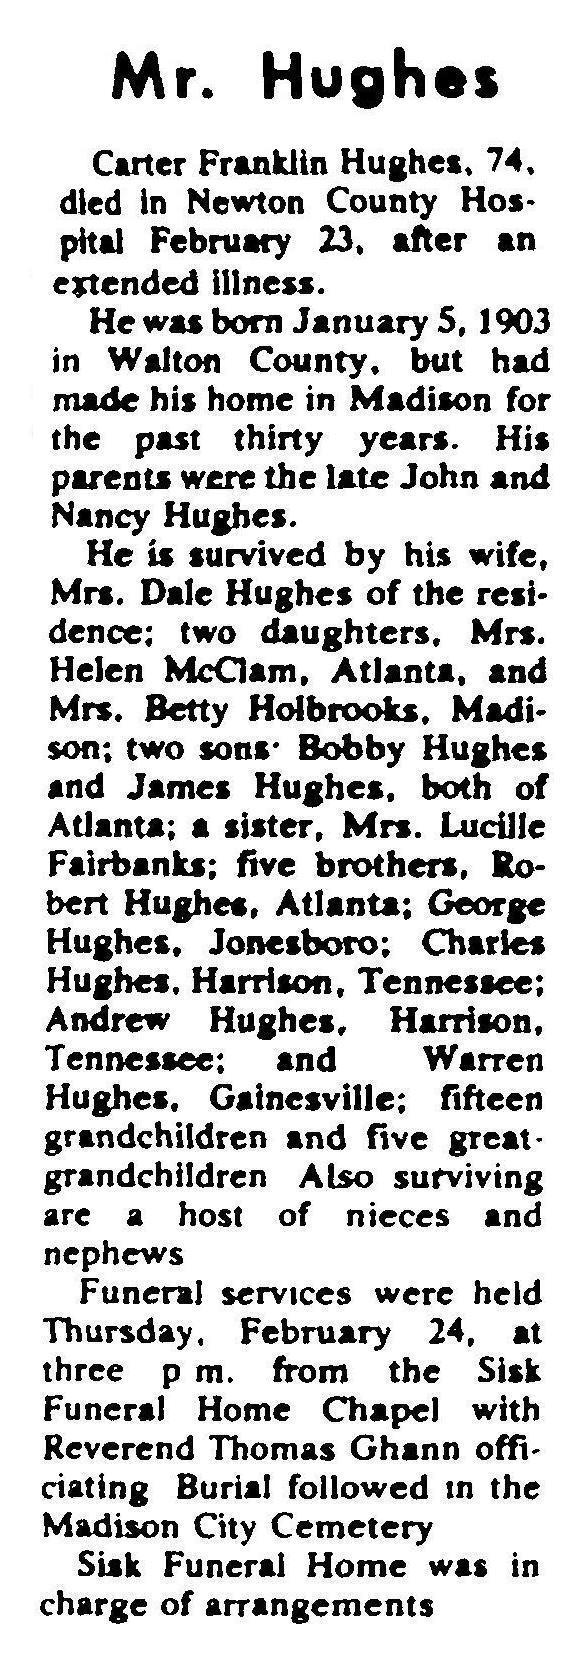 hughes_carterfranklin_1977-obituary.jpeg